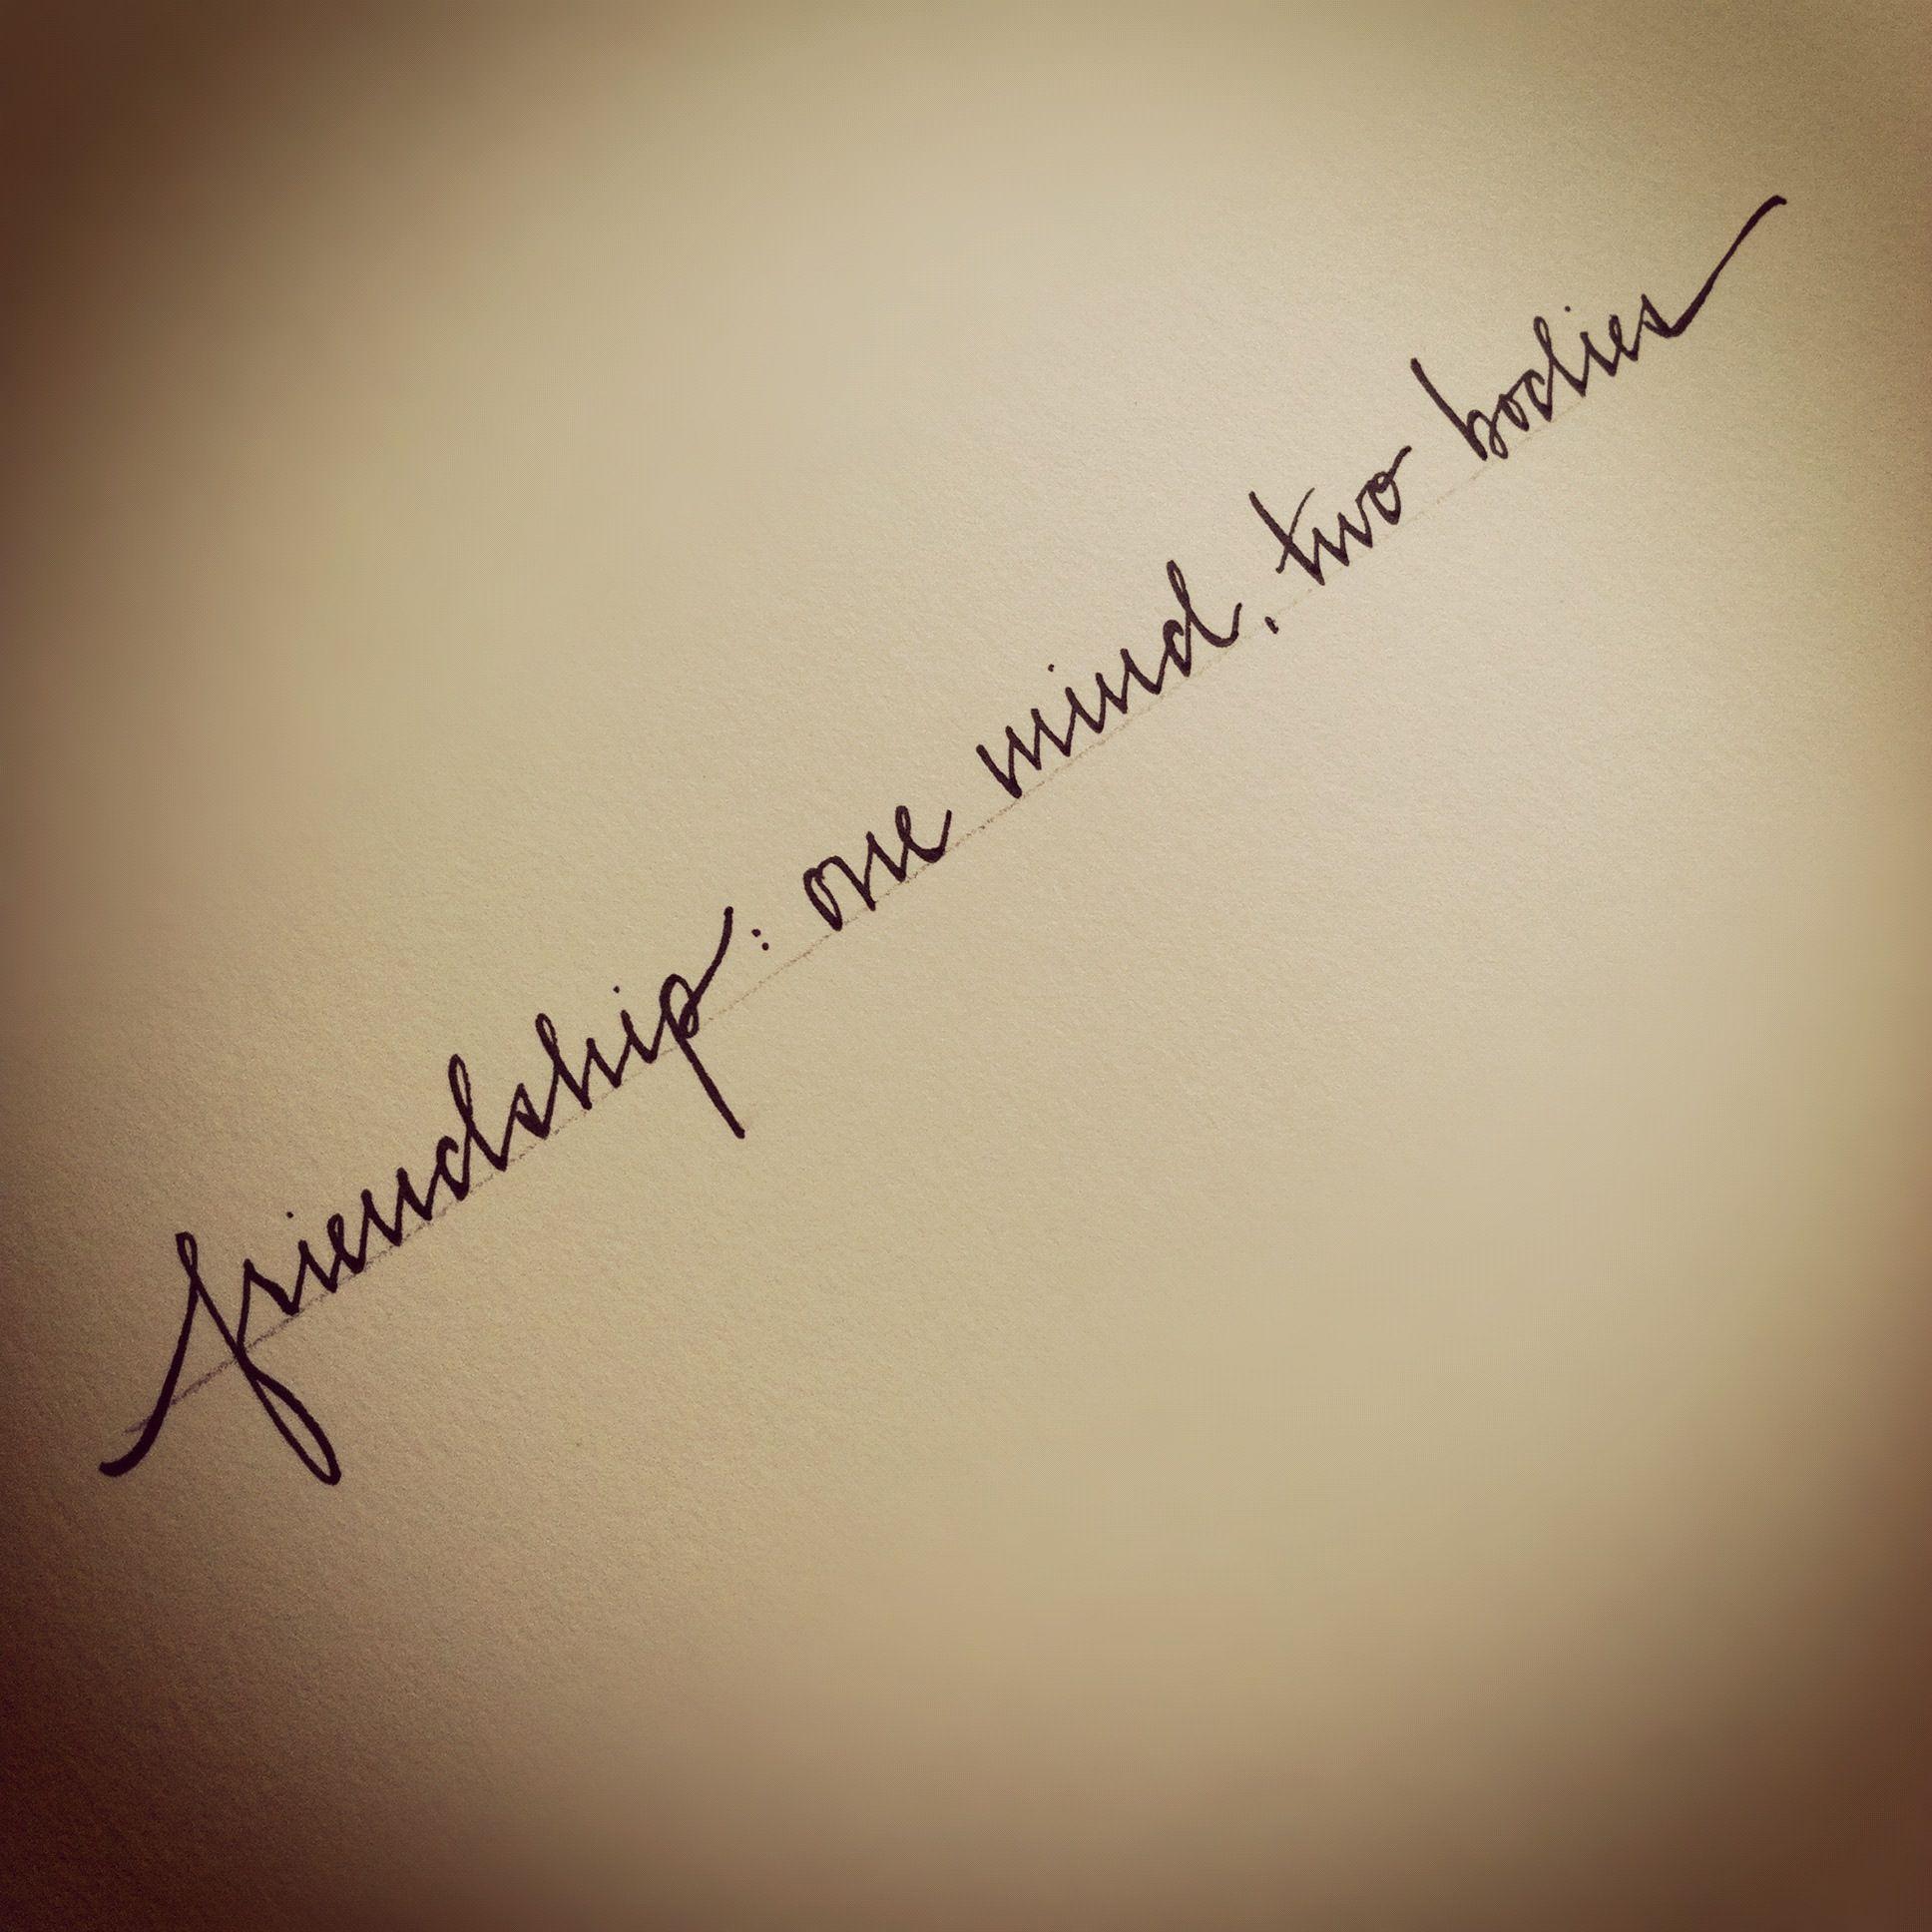 tattooing like whoa   Tattoo friendship, Friendship and Infinity ...